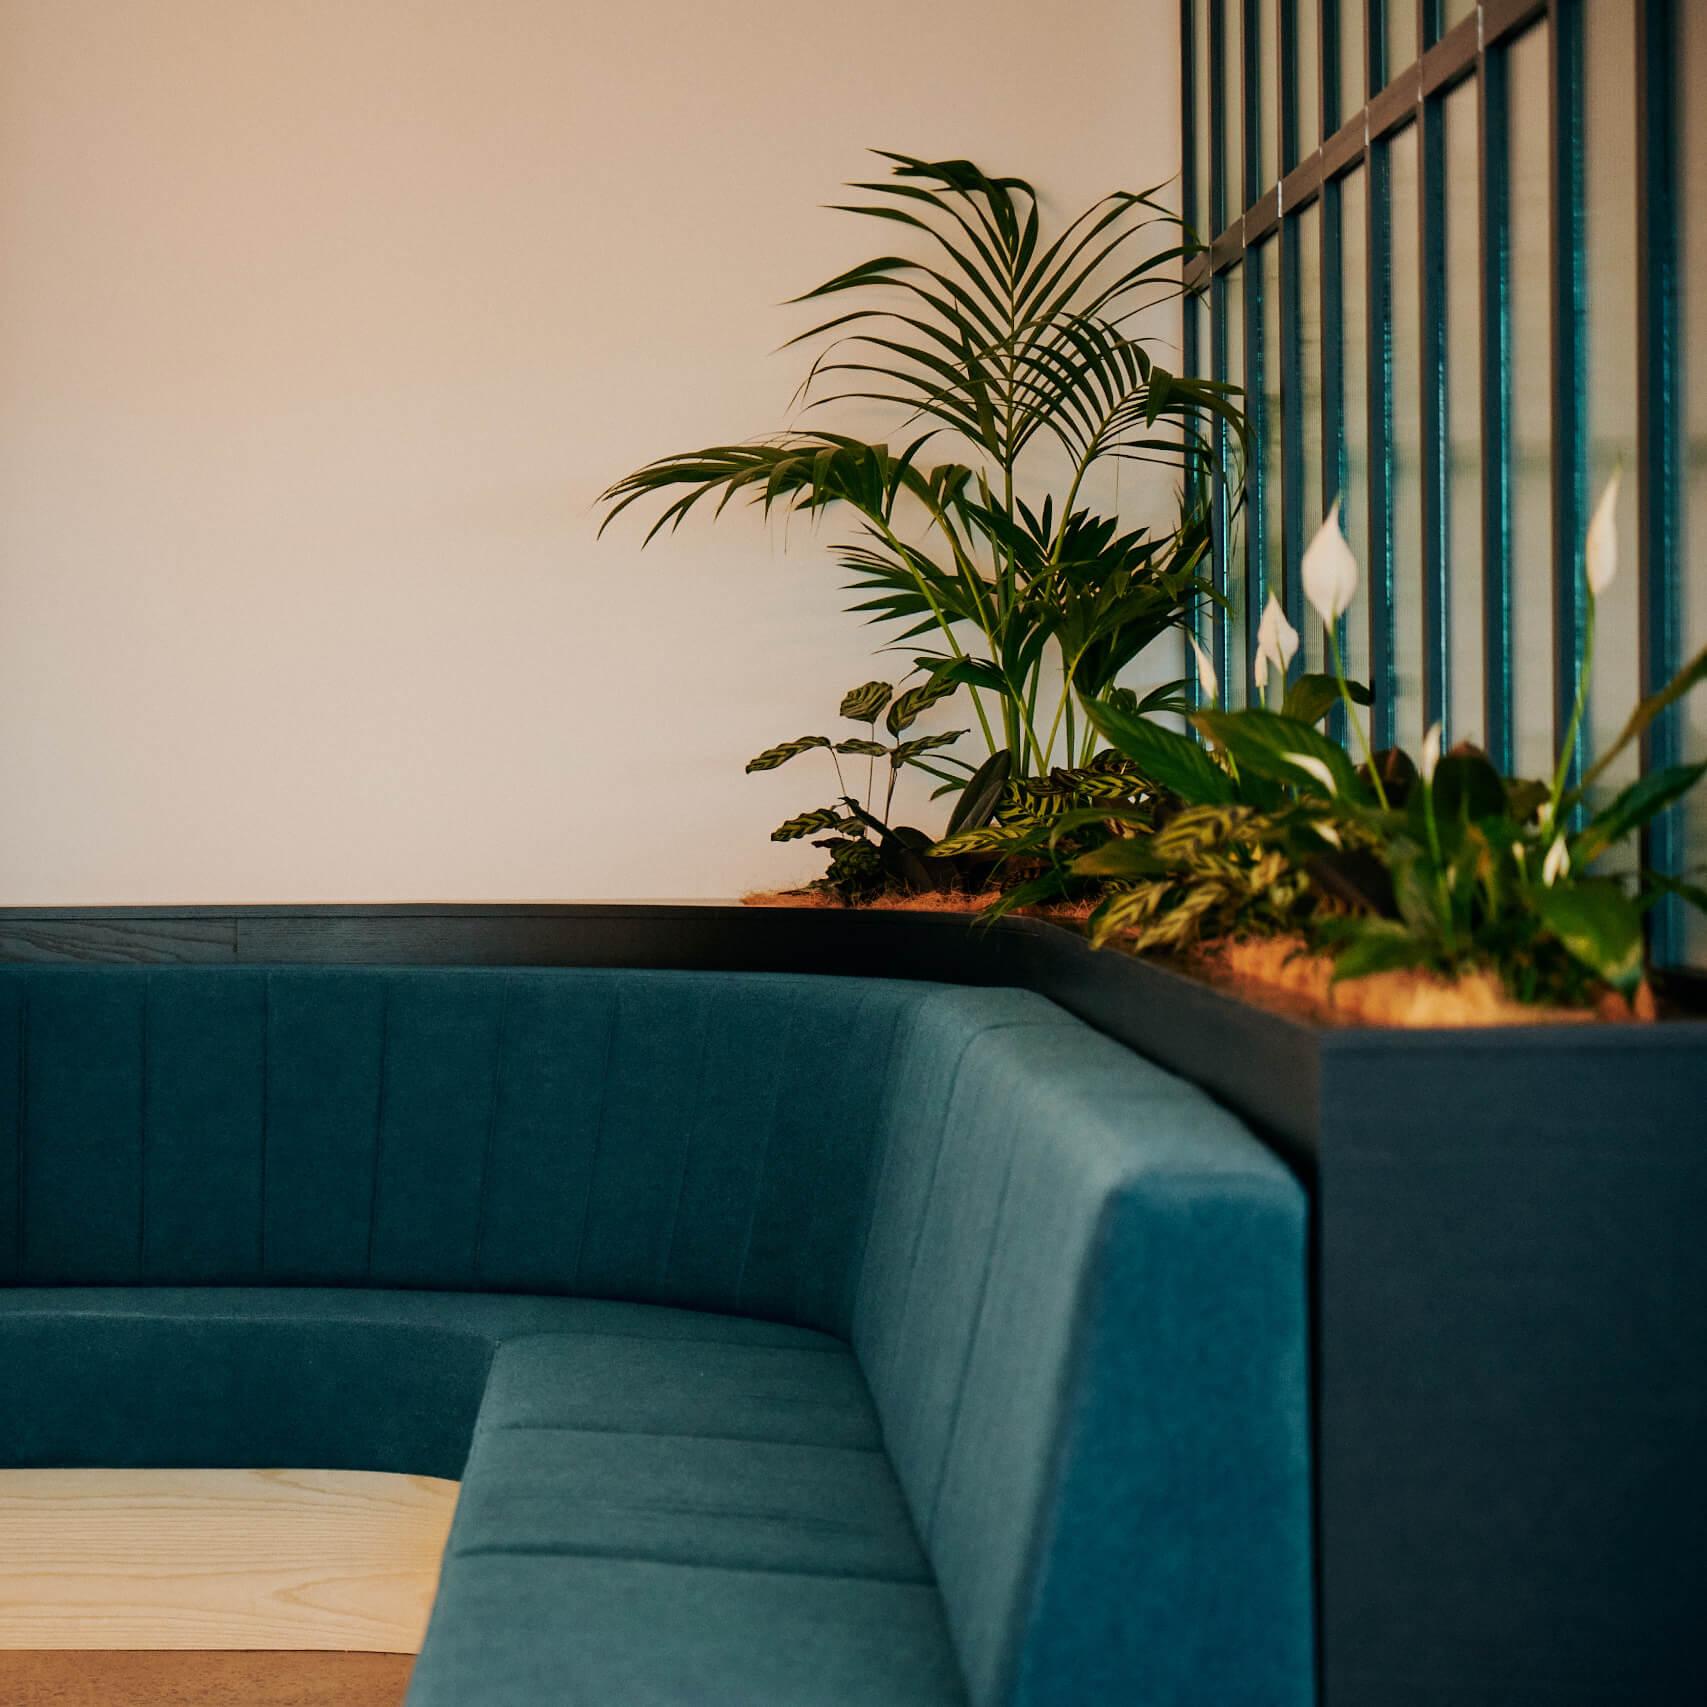 portfolio-offices-spaces-lumley-image3